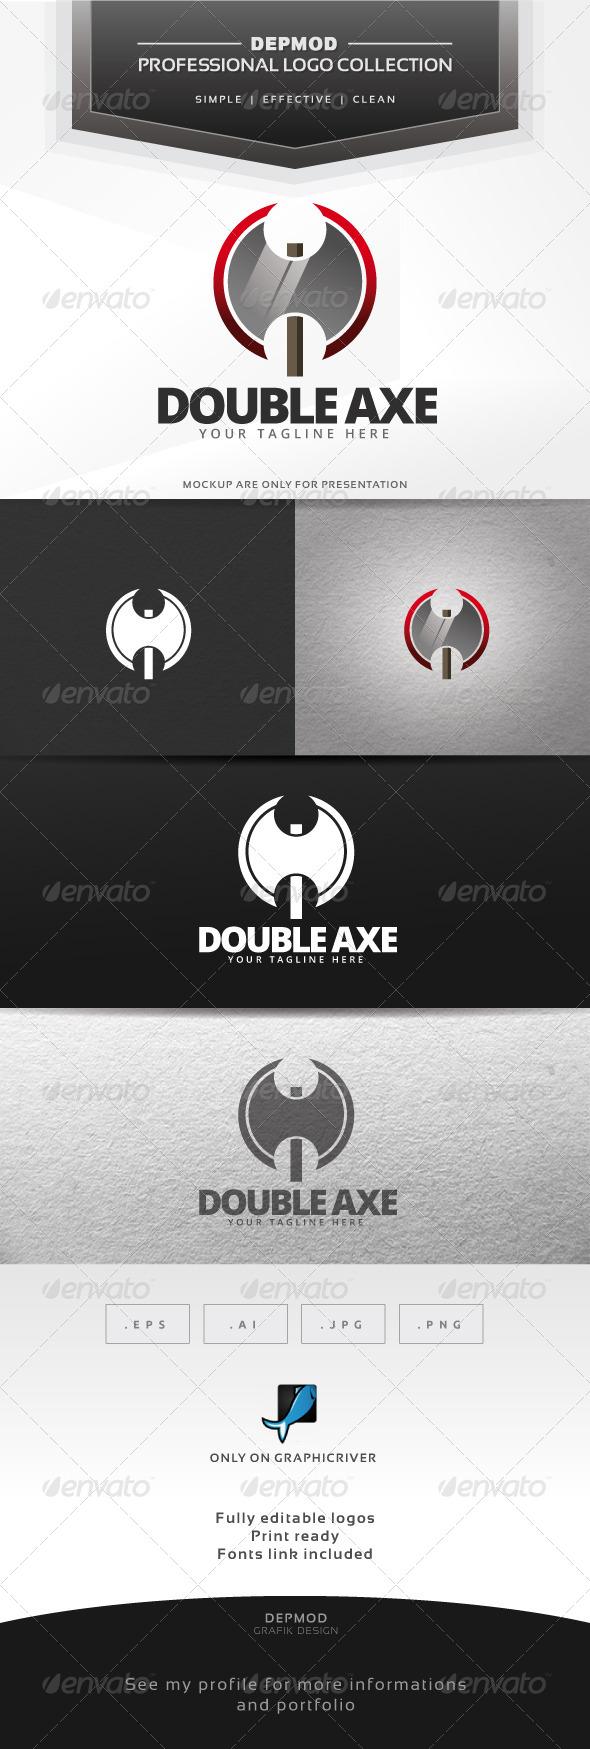 Double Axe Logo - Objects Logo Templates